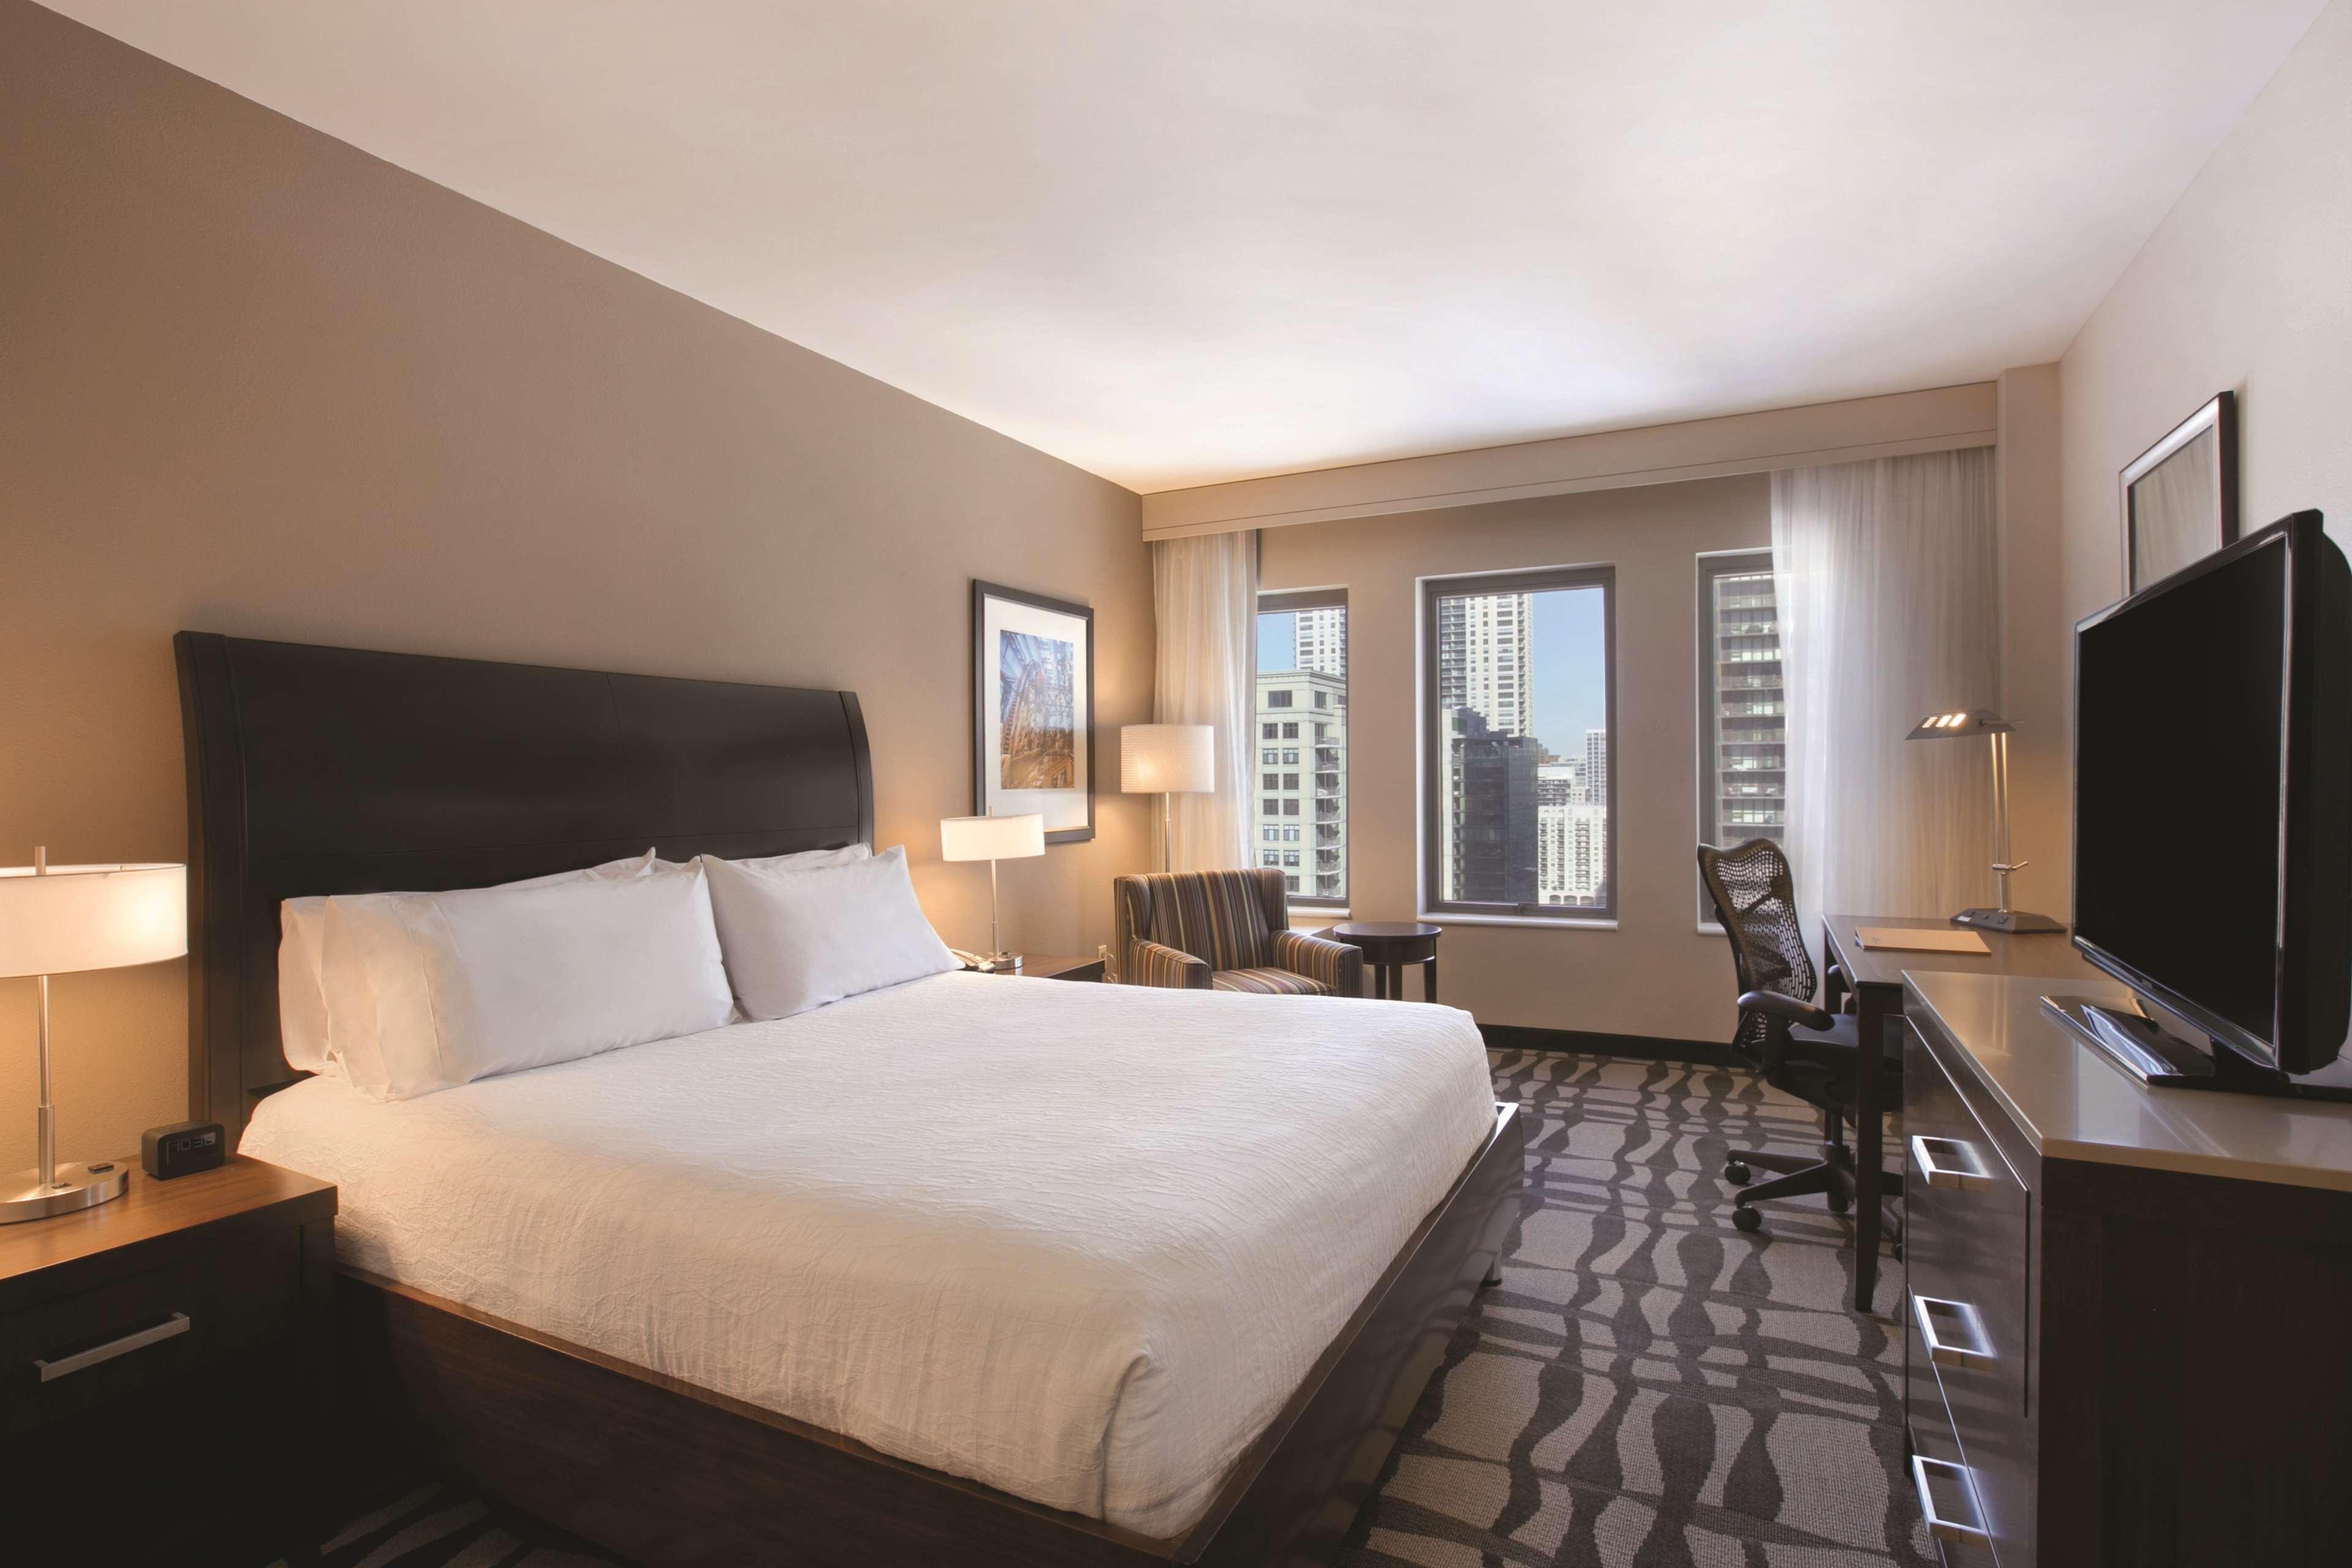 Hilton Garden Inn Chicago Downtown/Magnificent Mile image 25